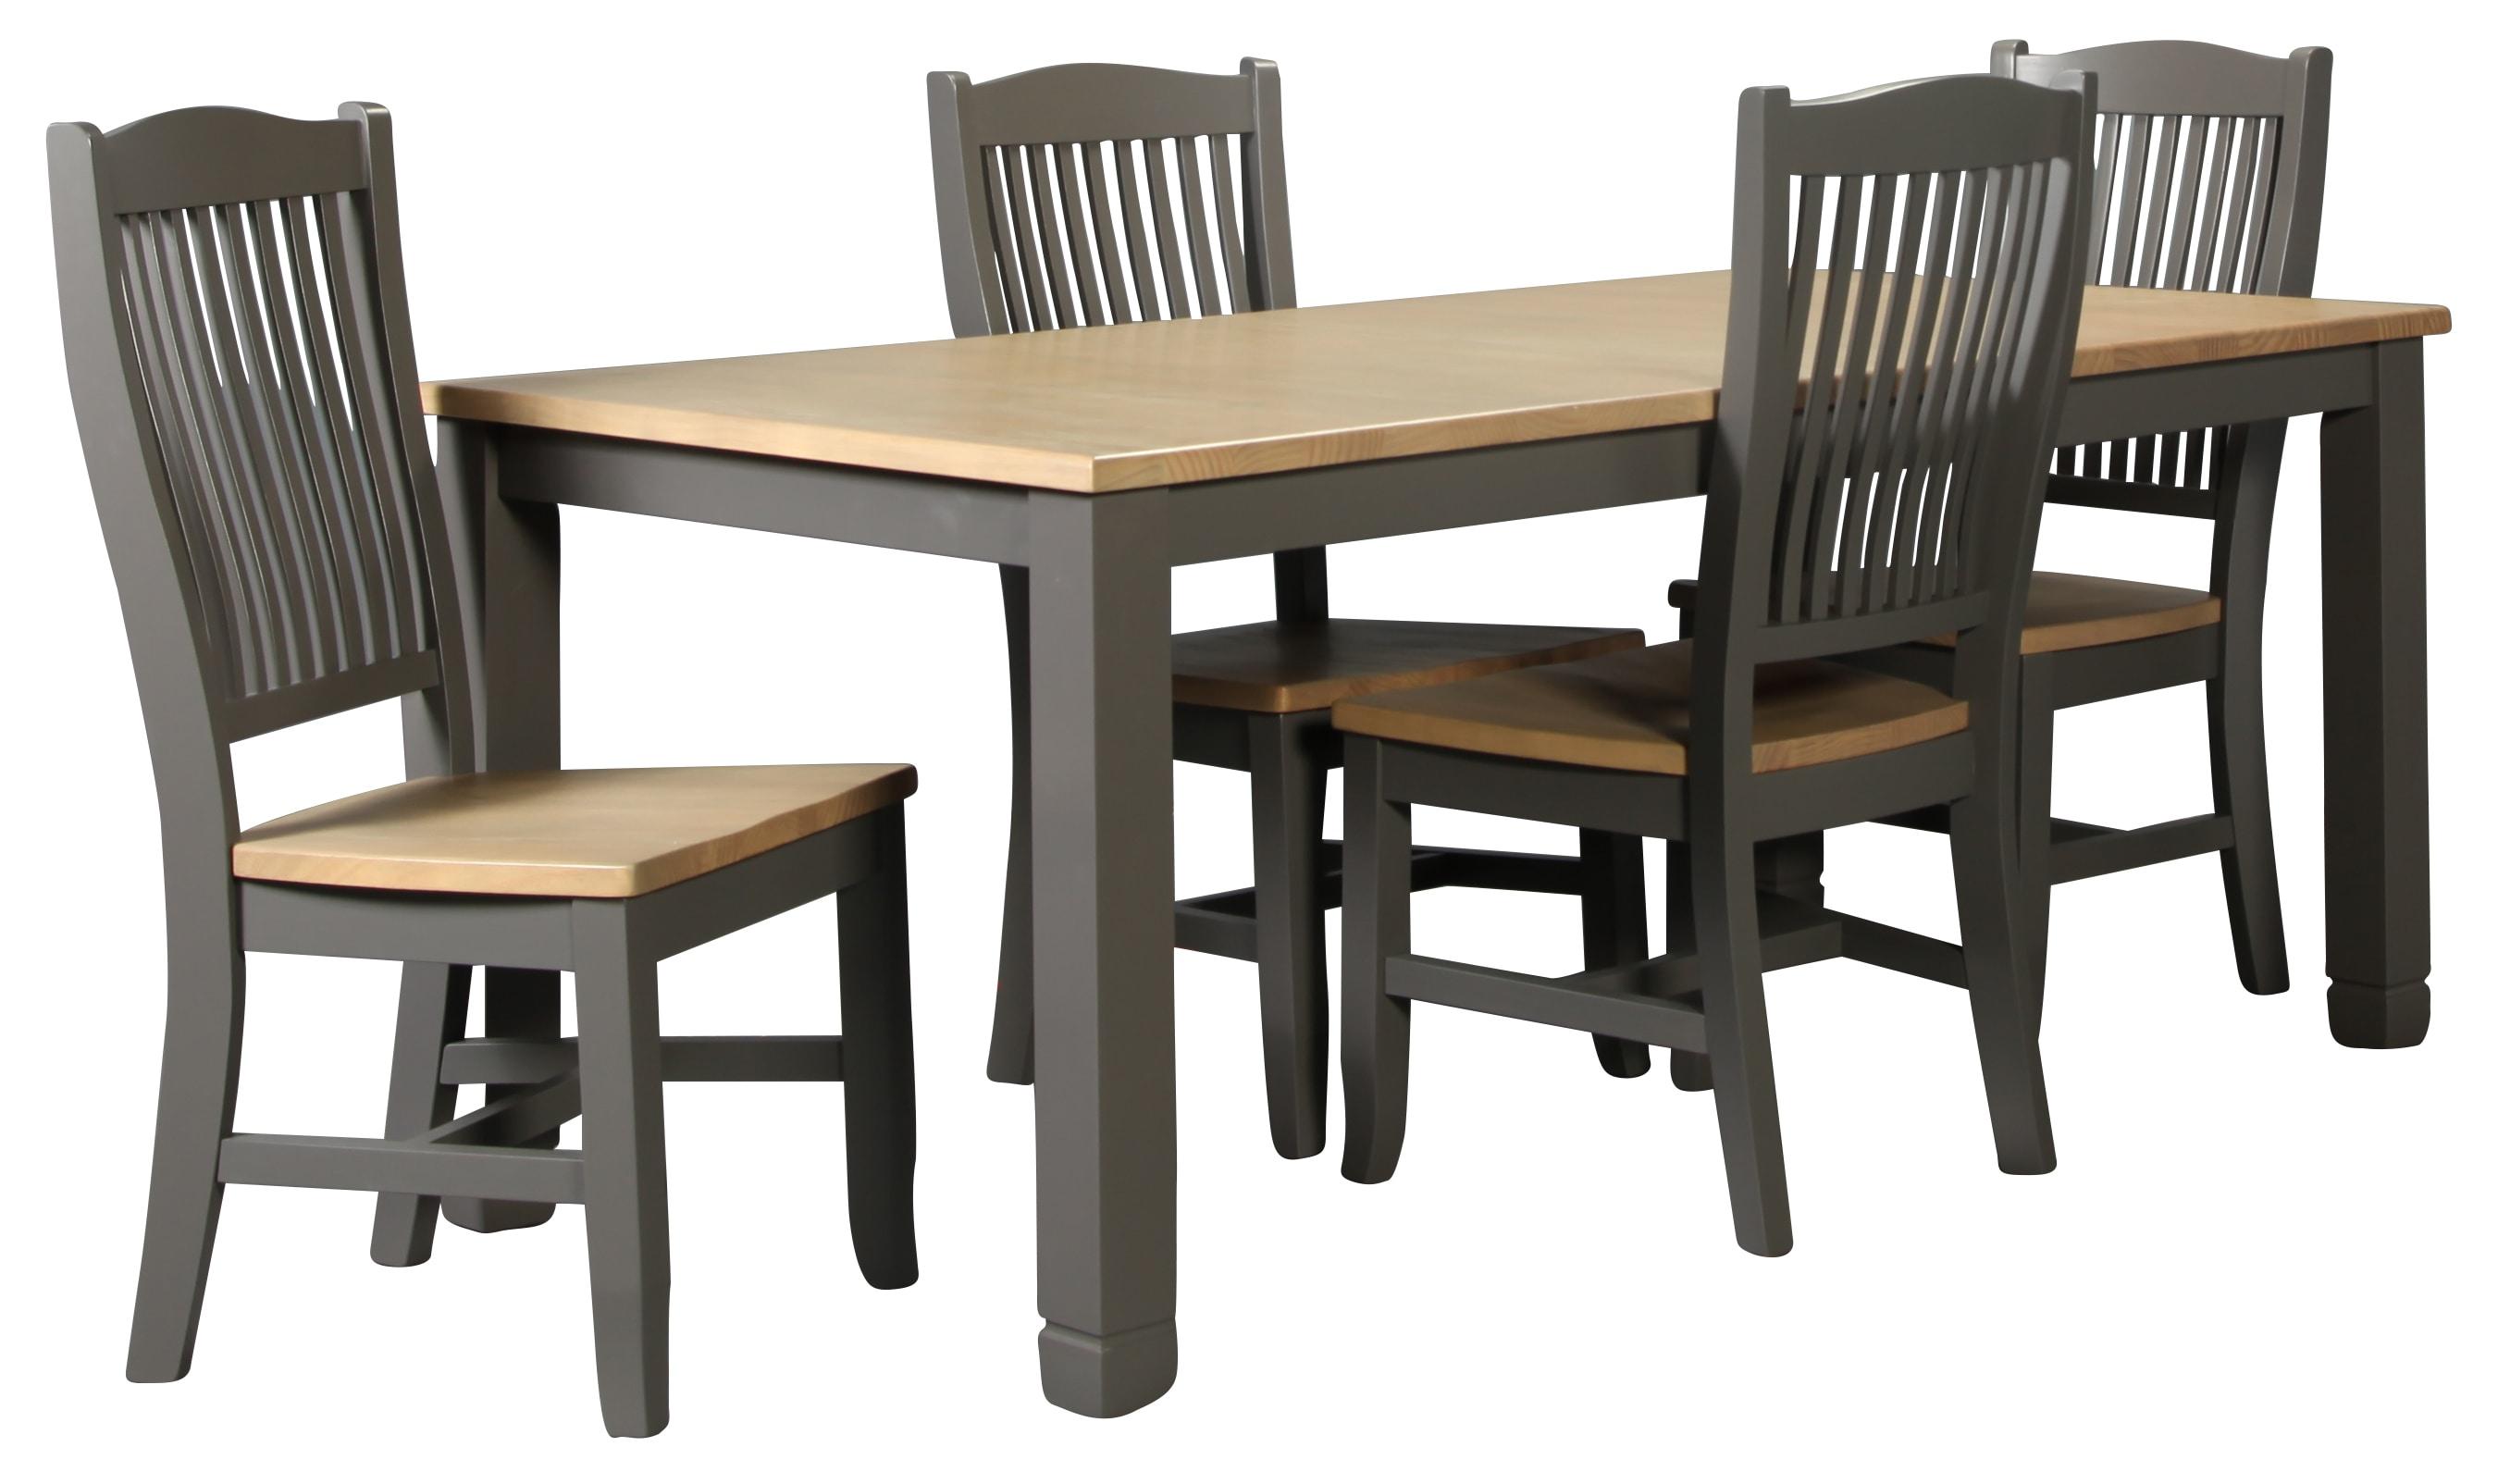 Marietta 5pc Dining Set